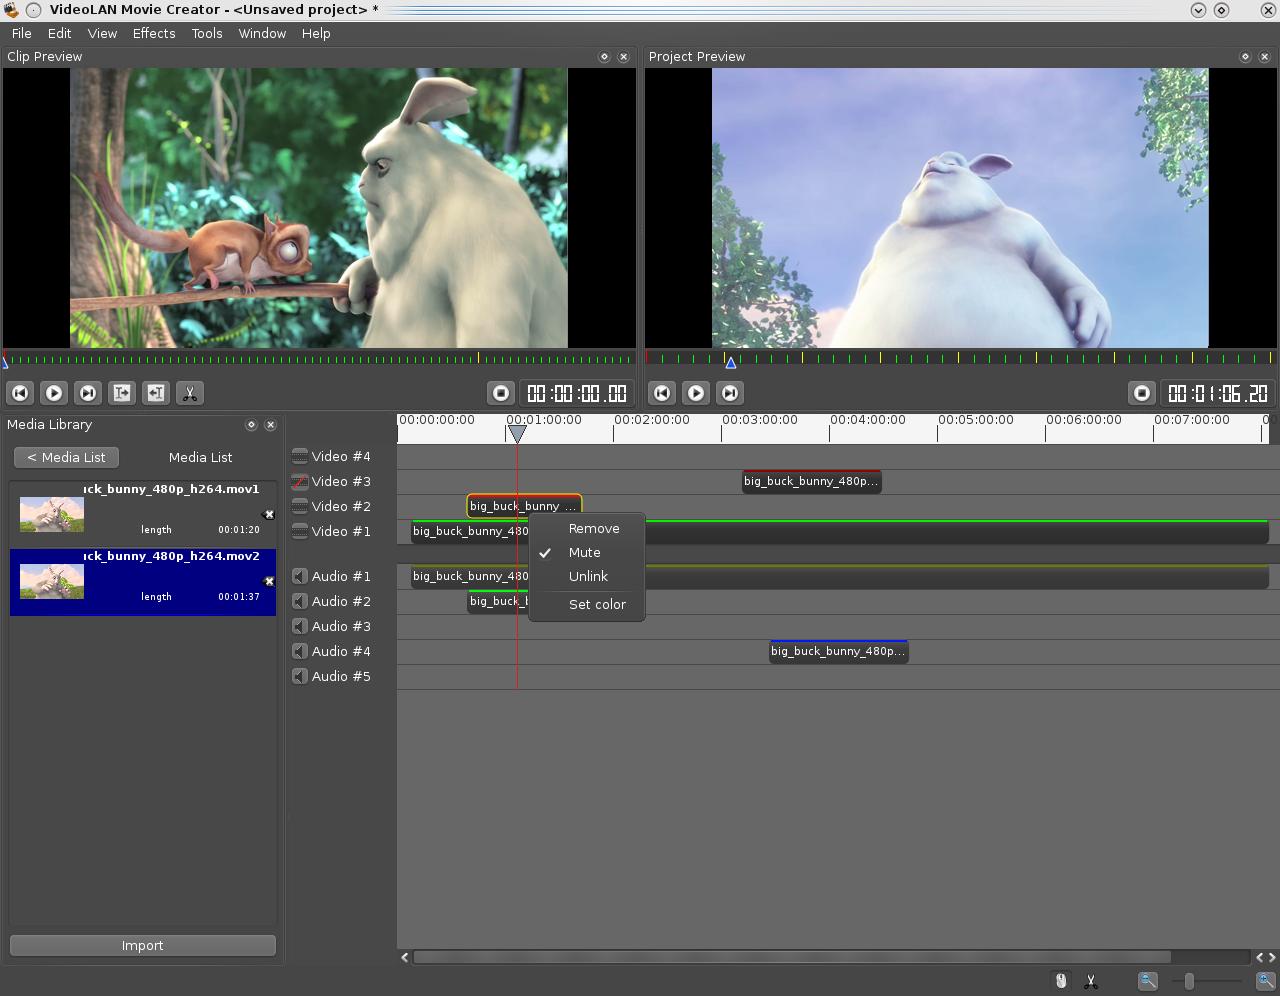 VLMC gratis videoredigeringsprogram